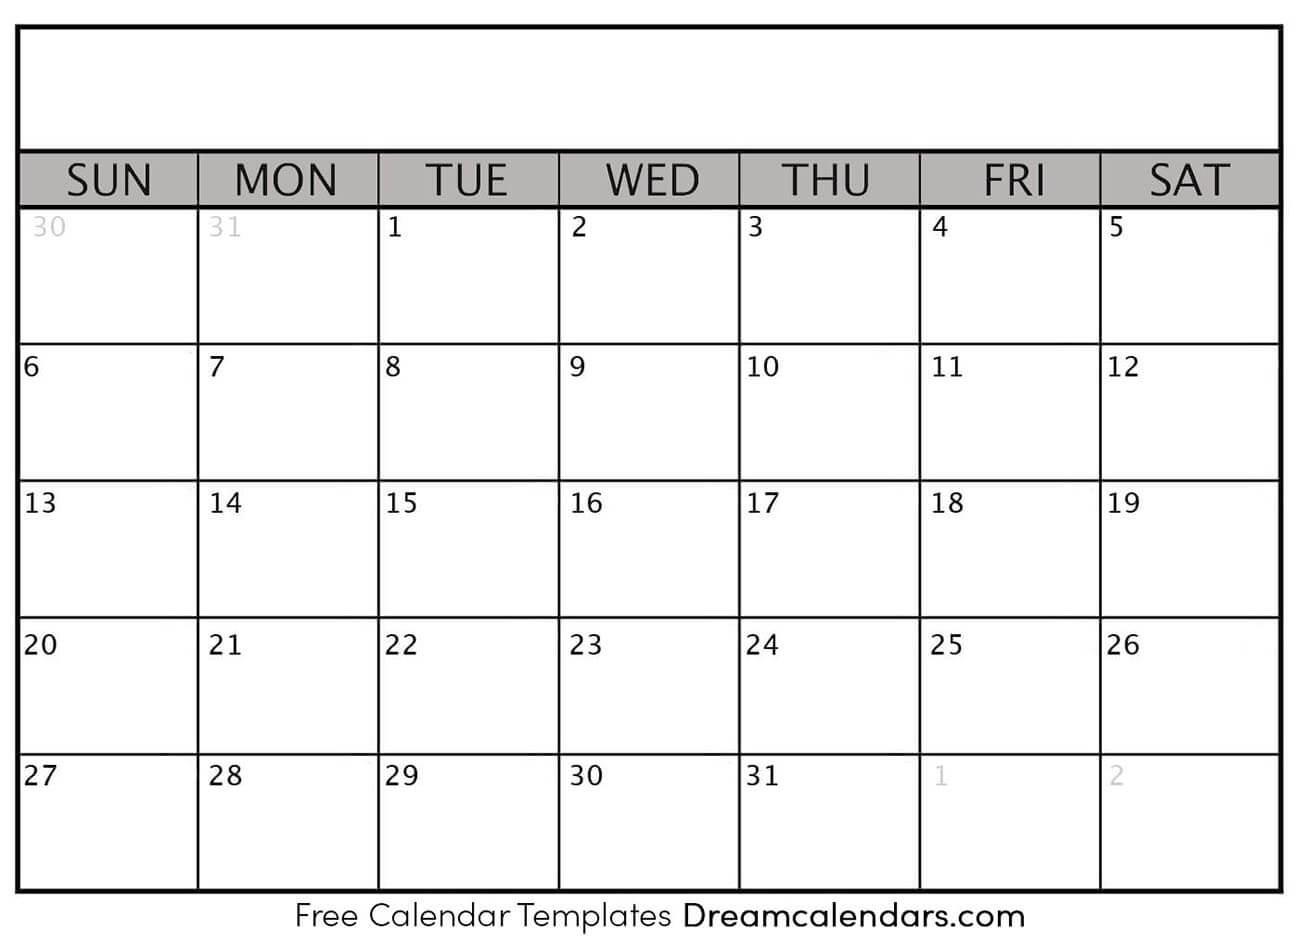 Printable Blank Calendar 2021 | Dream Calendars  Free Calendar Templates Printable